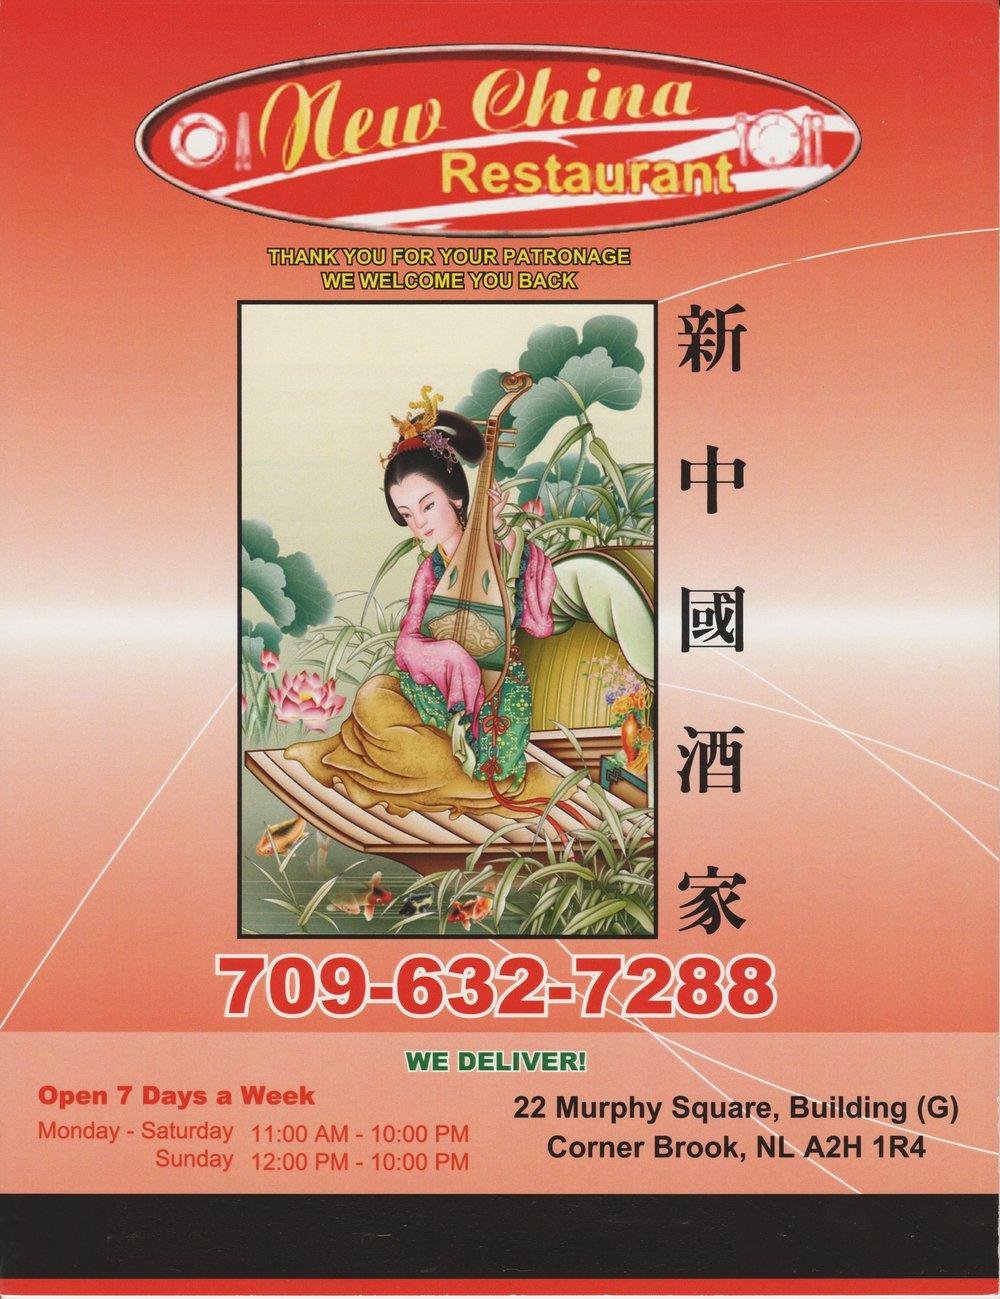 New China Restaurant Menu Cover 2.jpg